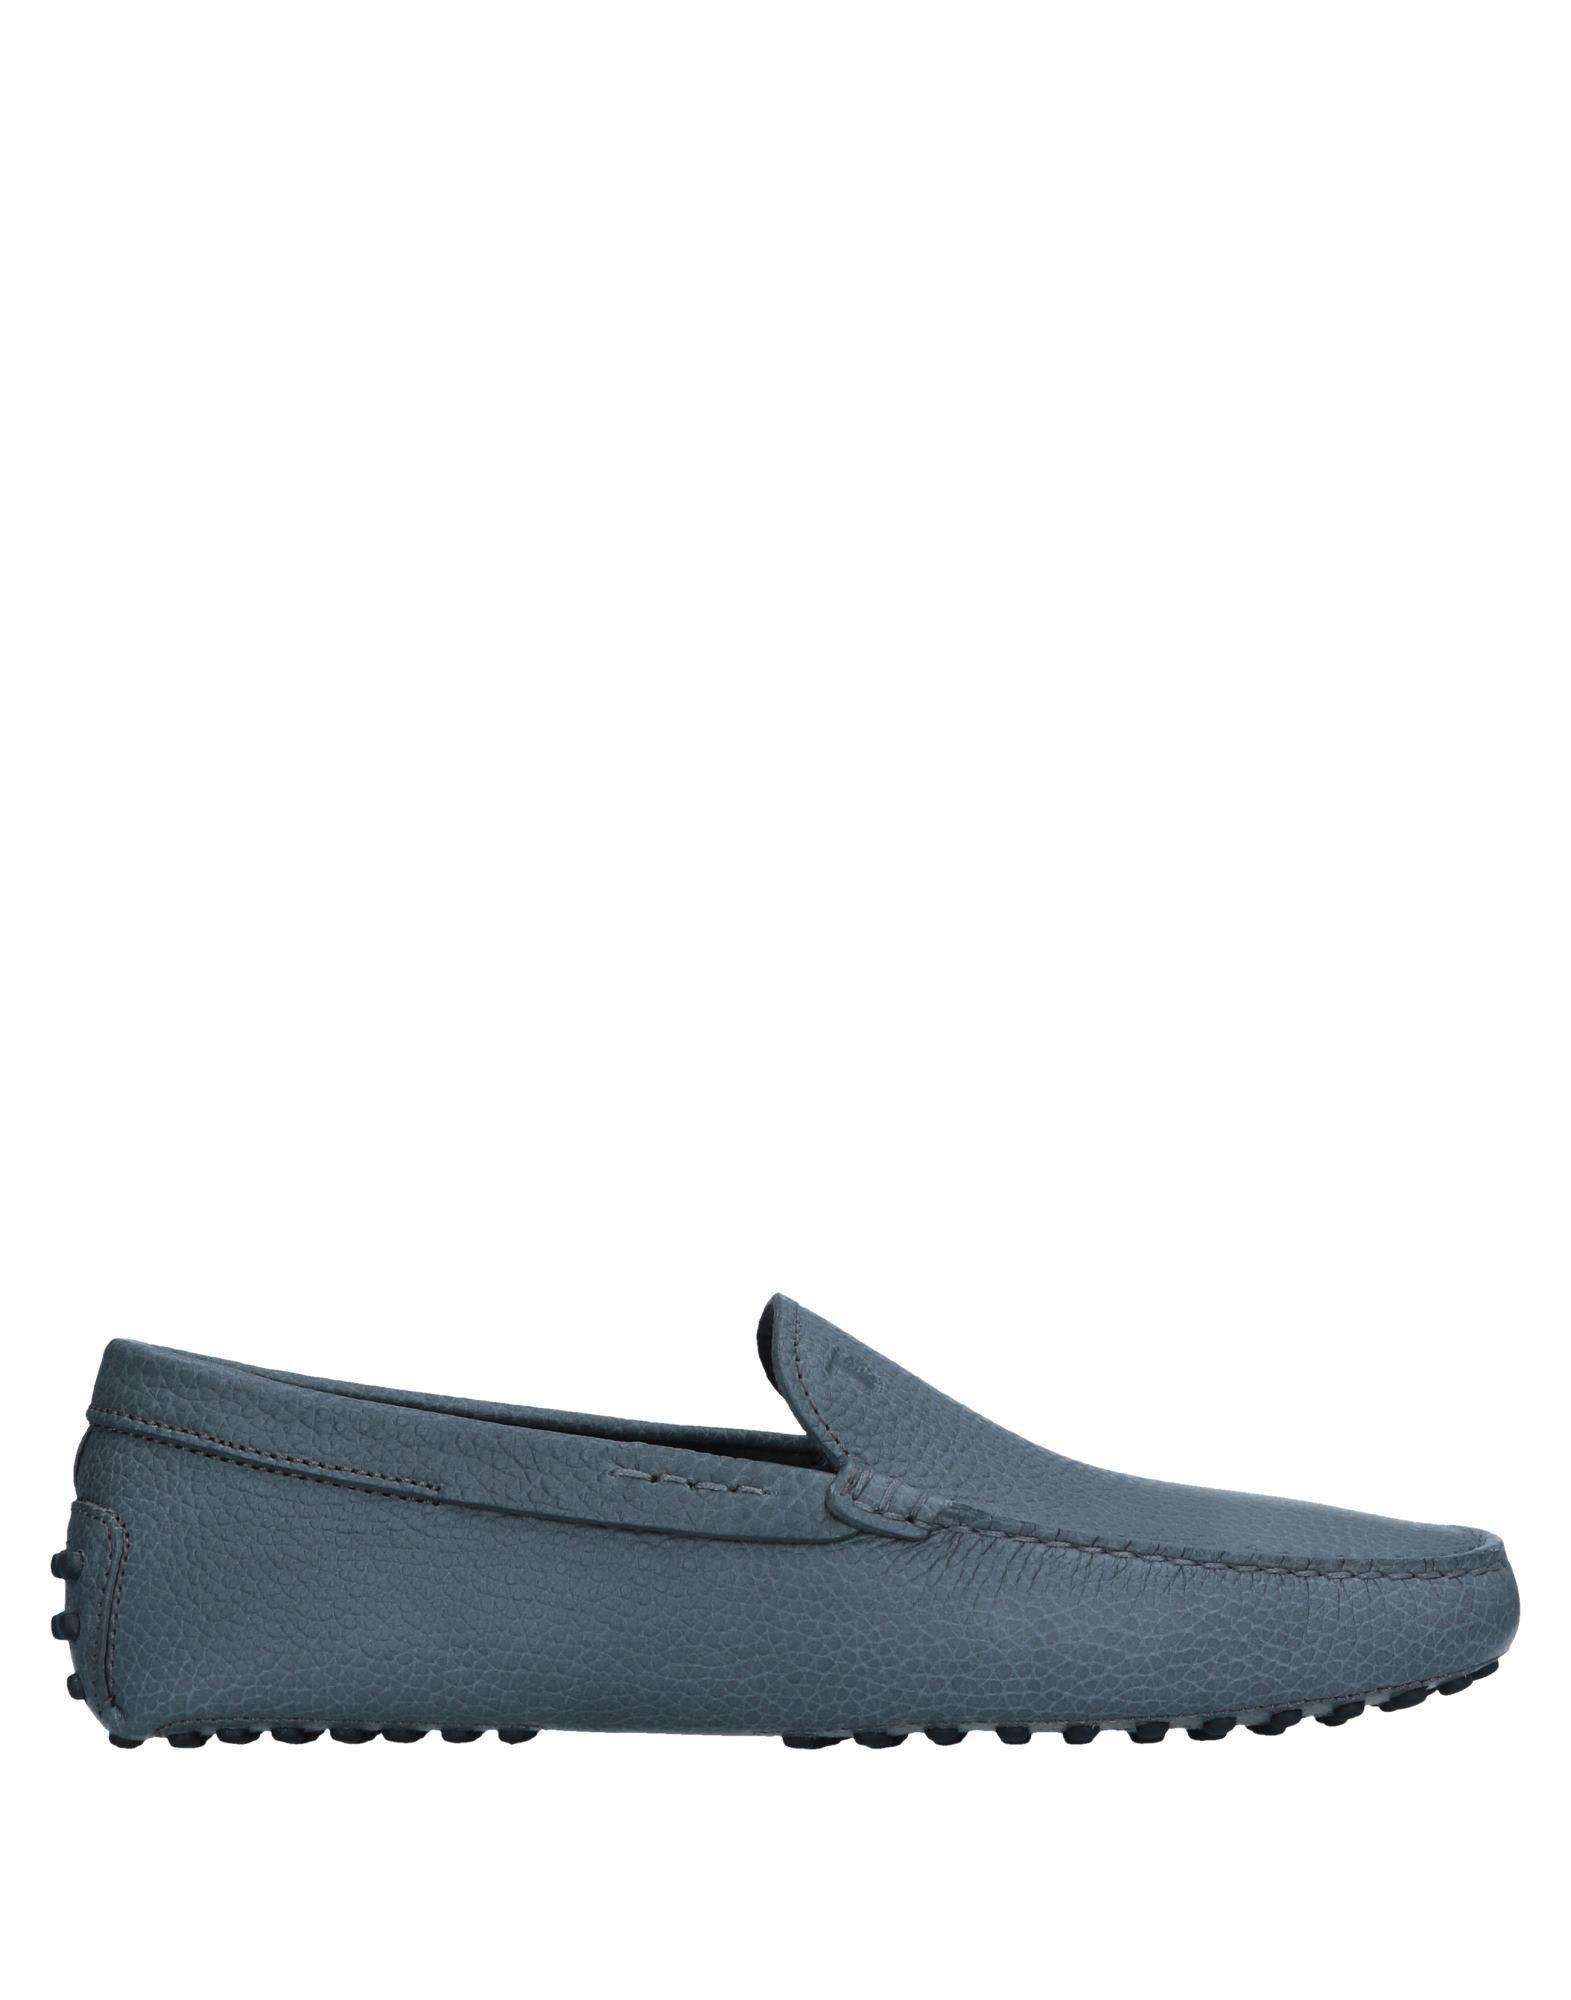 Tod's Mokassins Herren  11548376IP Gute Qualität beliebte Schuhe